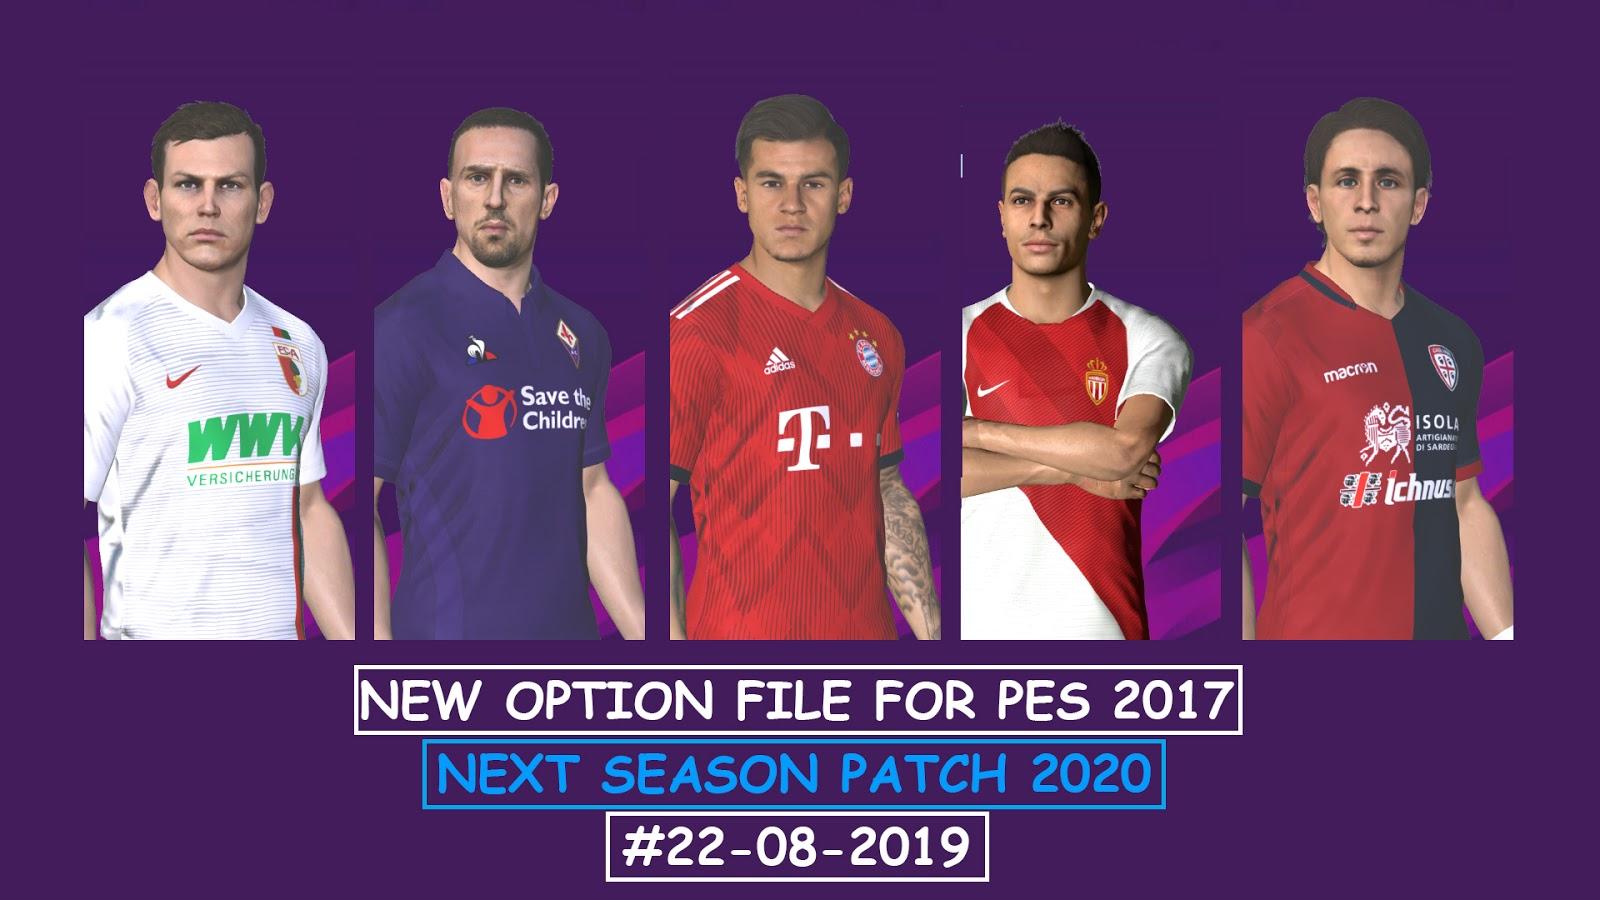 PES 2017 Option File For Next Season Patch 2020 #03-09-2019